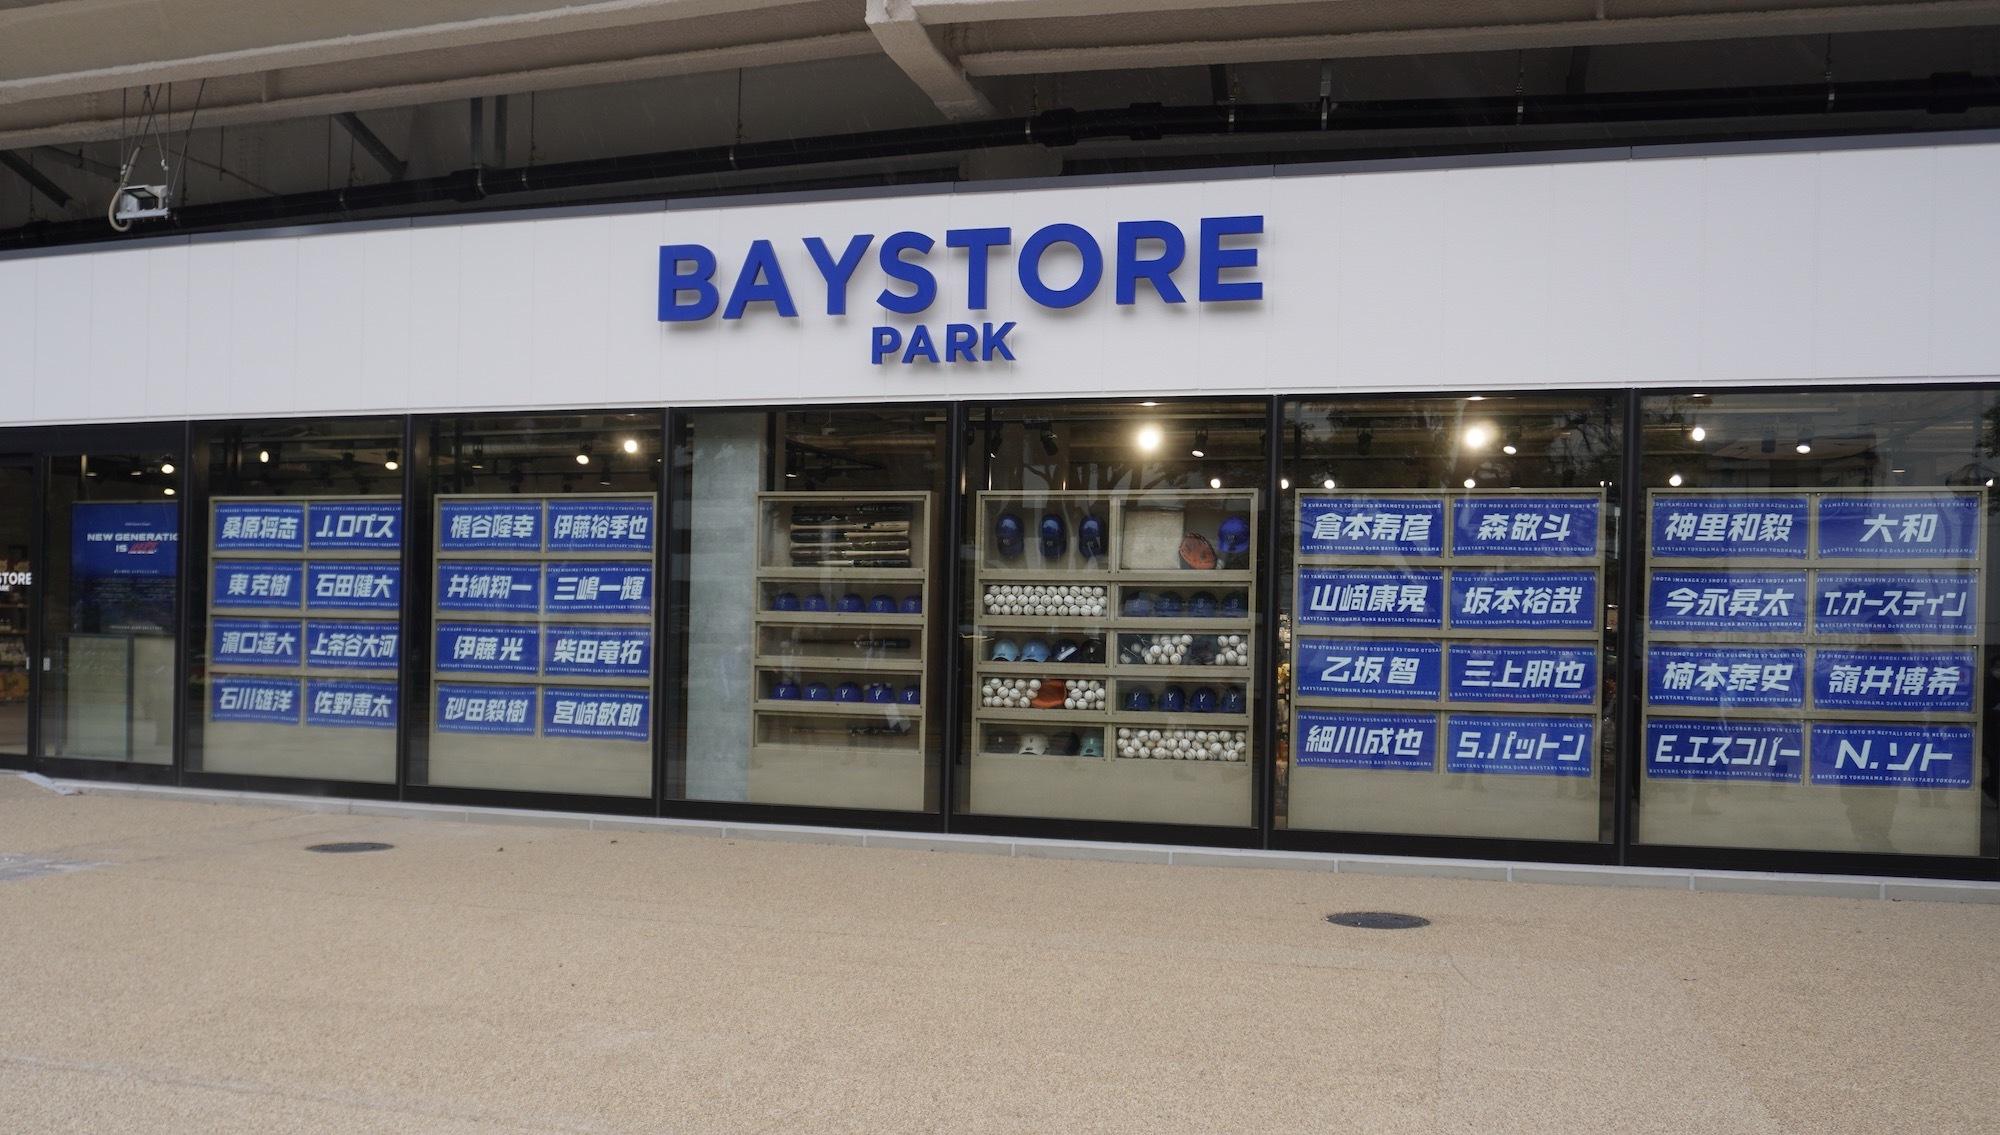 BAYSTORE PARK